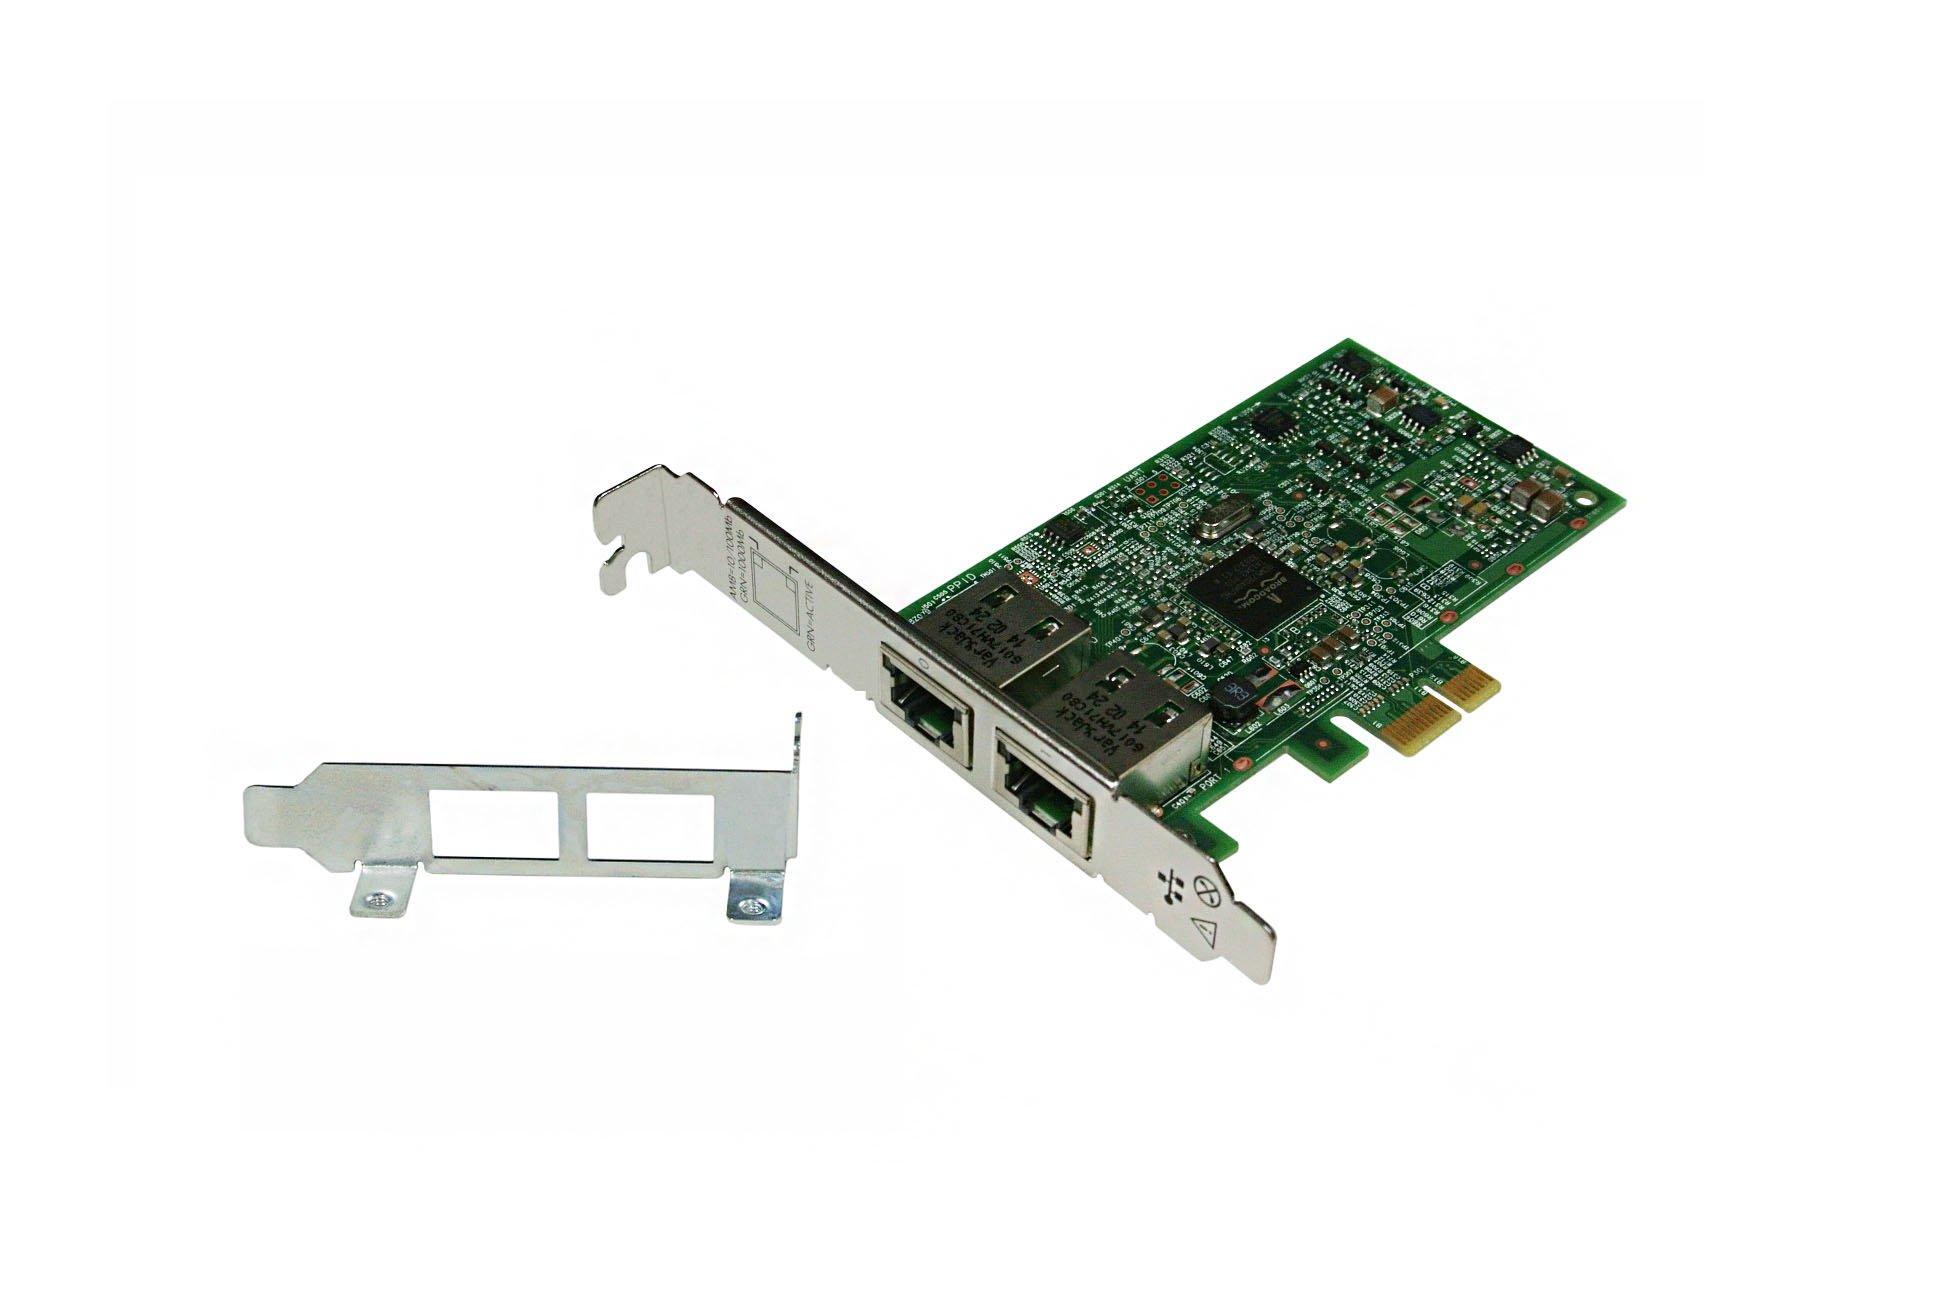 Broadcom DELL D9VTT 2x10 Gigabit PCI-E x8 Mezzanine LOM Network Controller Card M710H